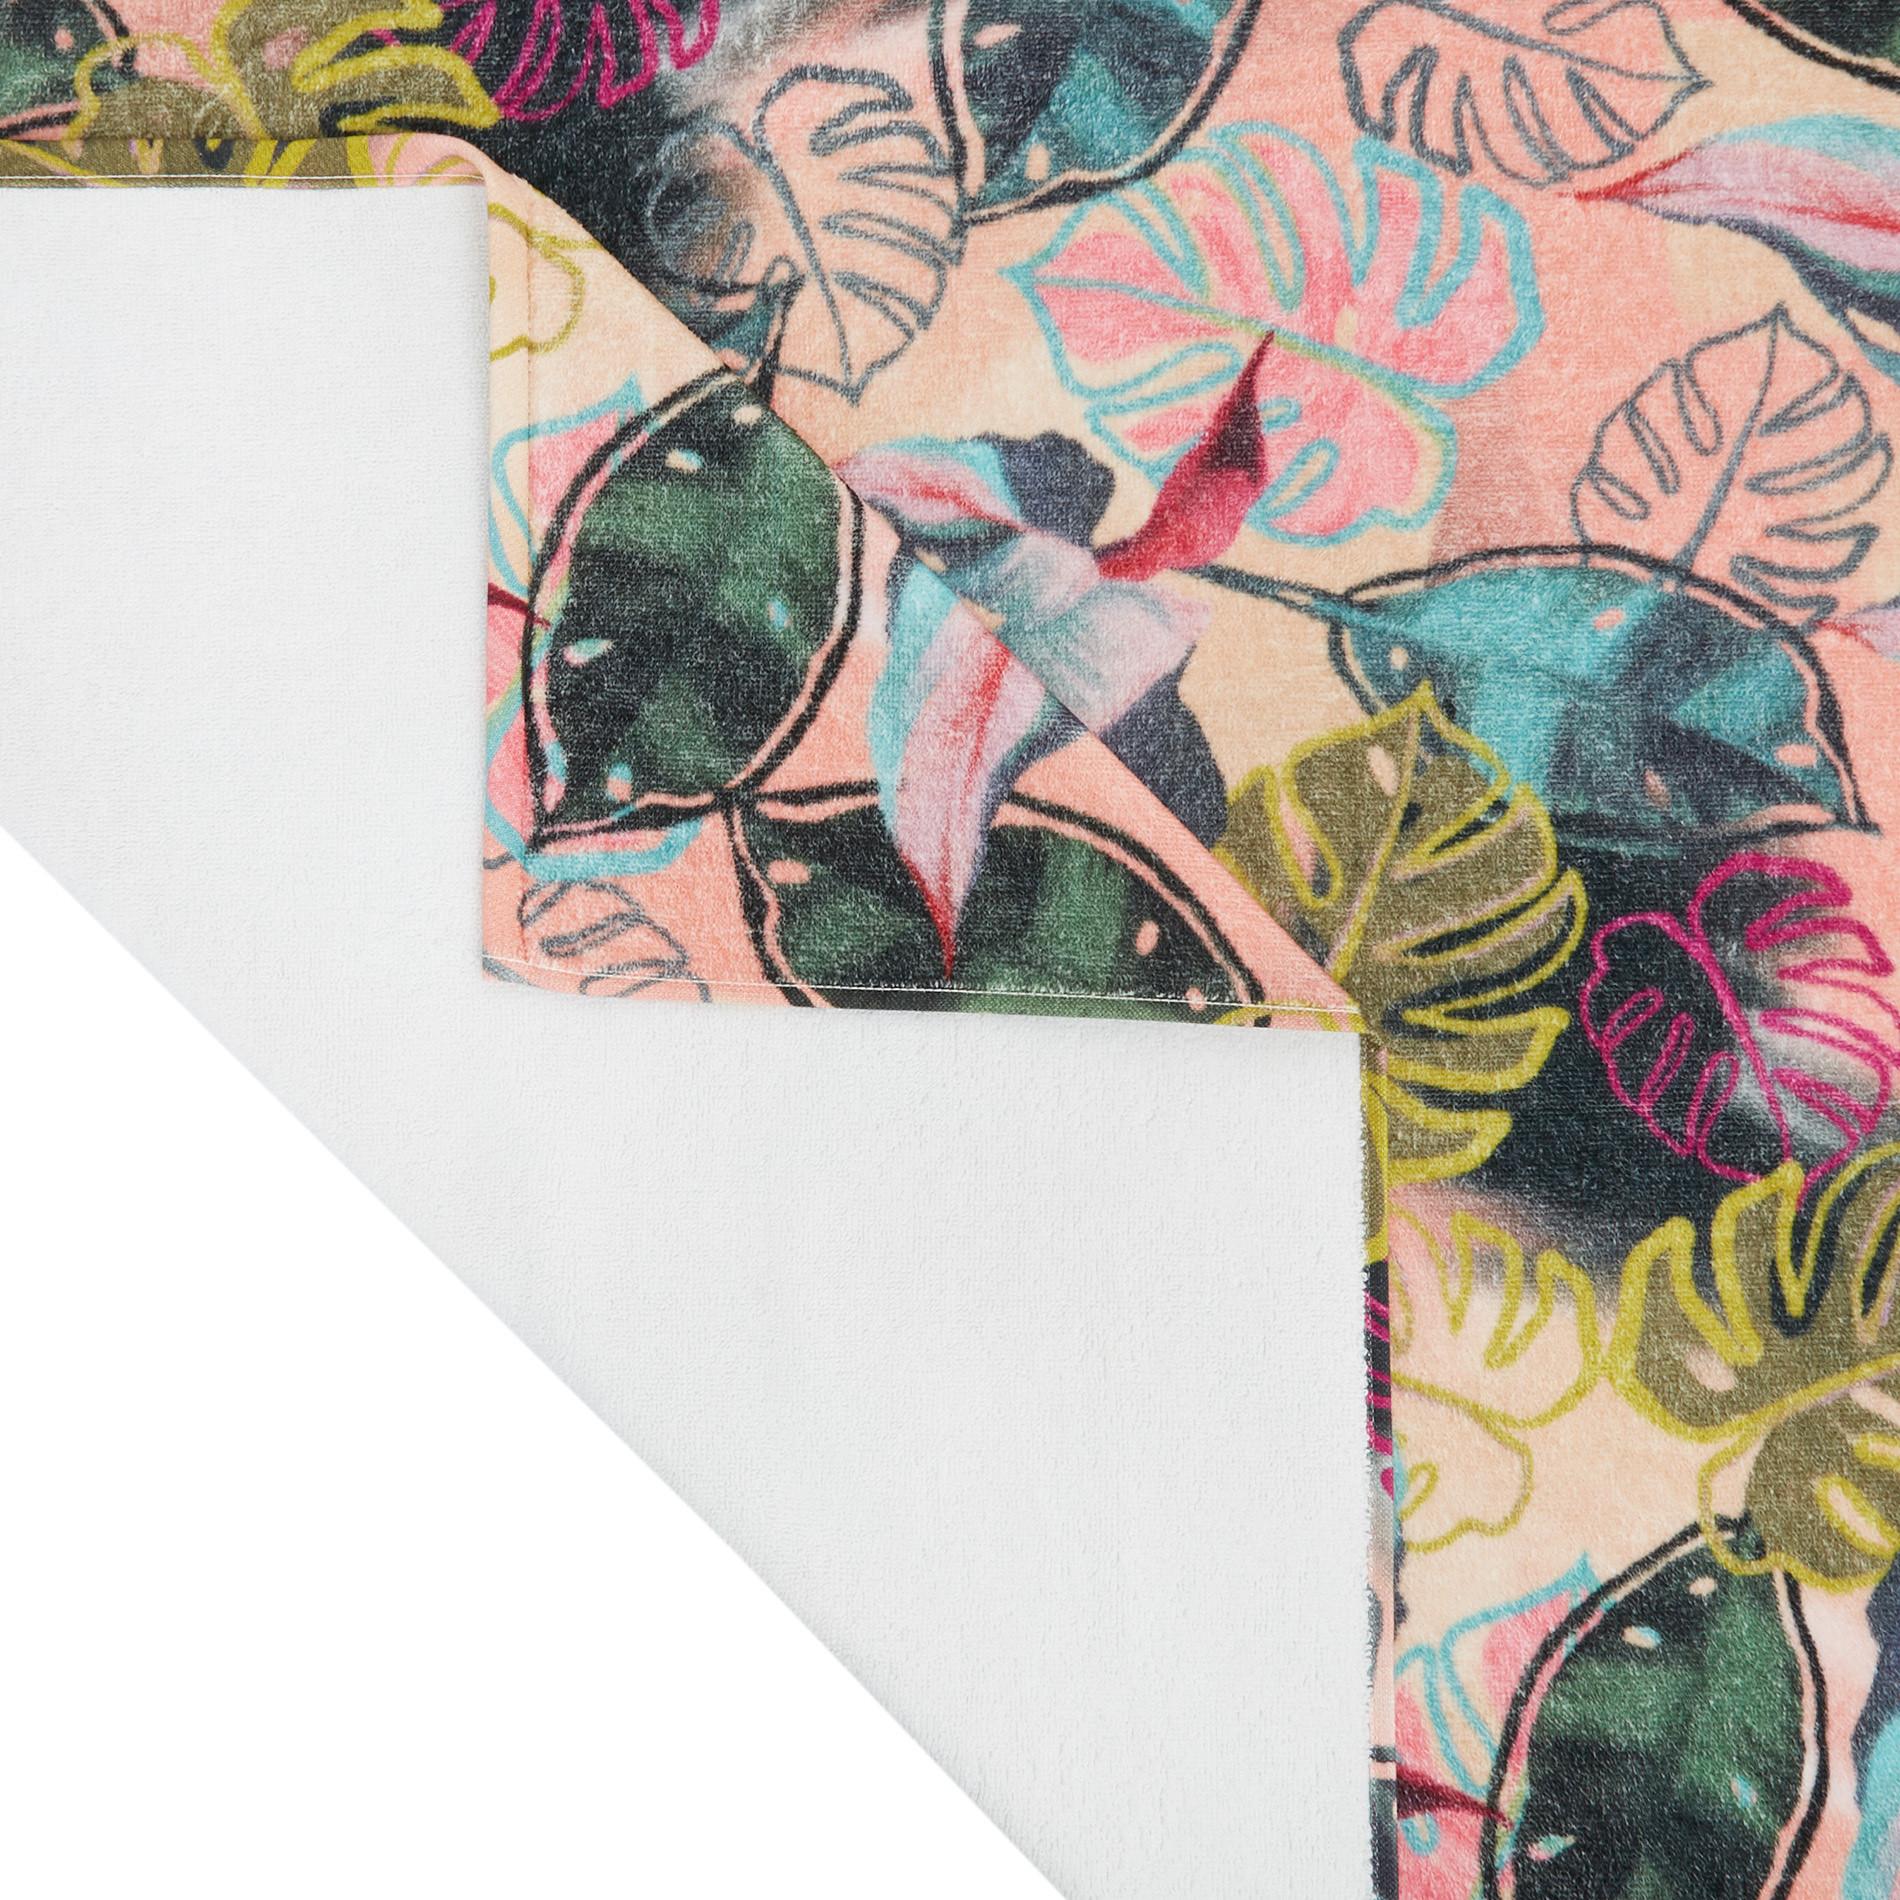 Telo mare cotone velour stampa digitale multicolore, Multicolor, large image number 1